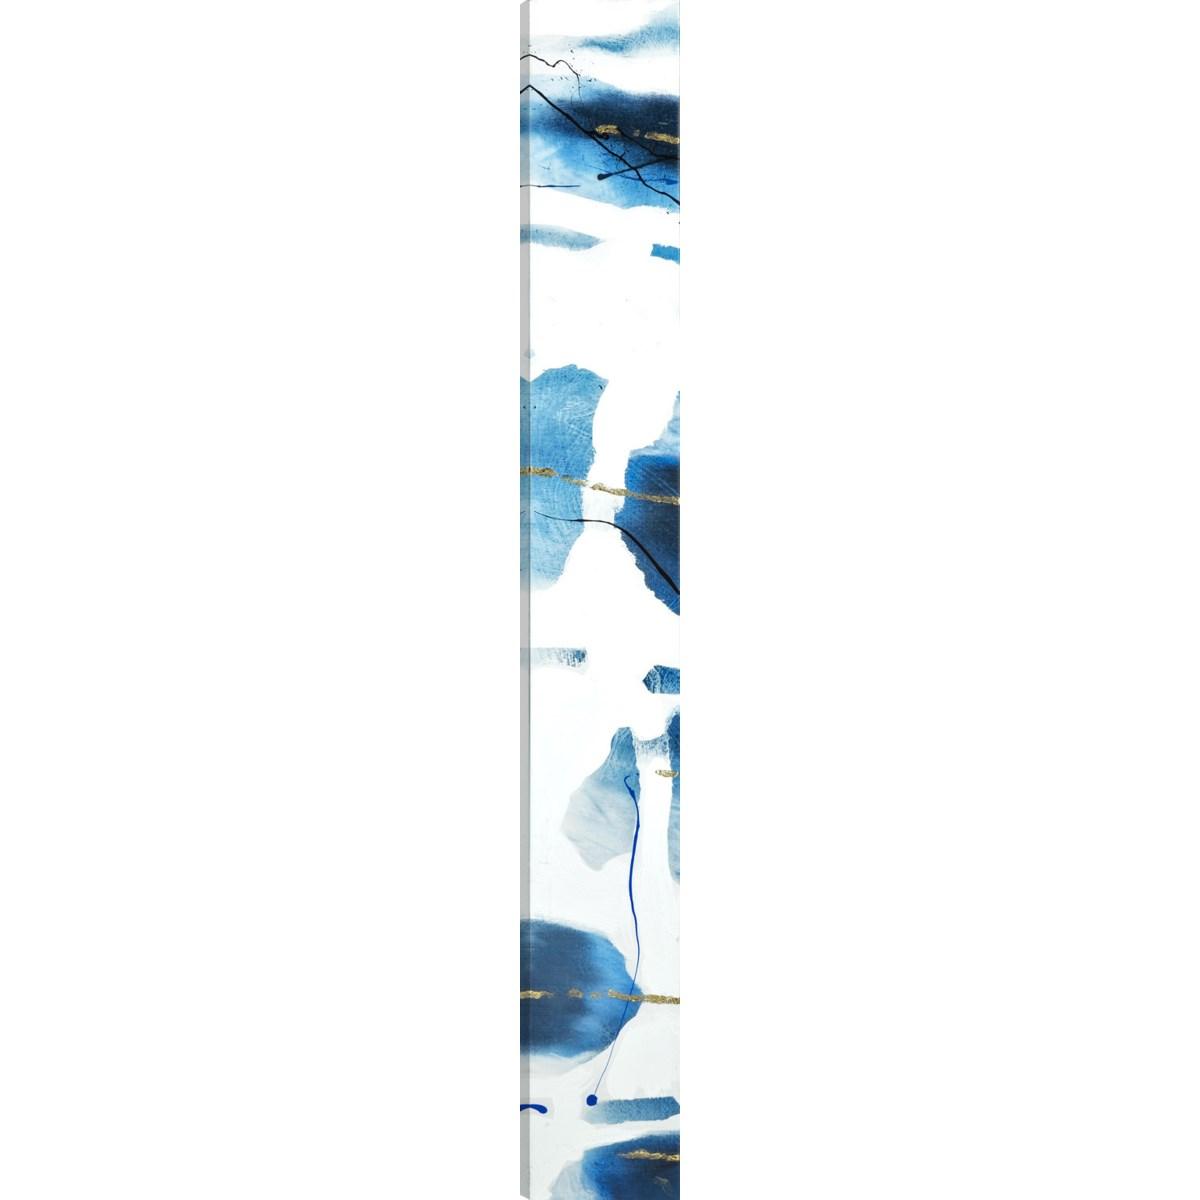 BLUE ENERGY III - HIGH GLOSS